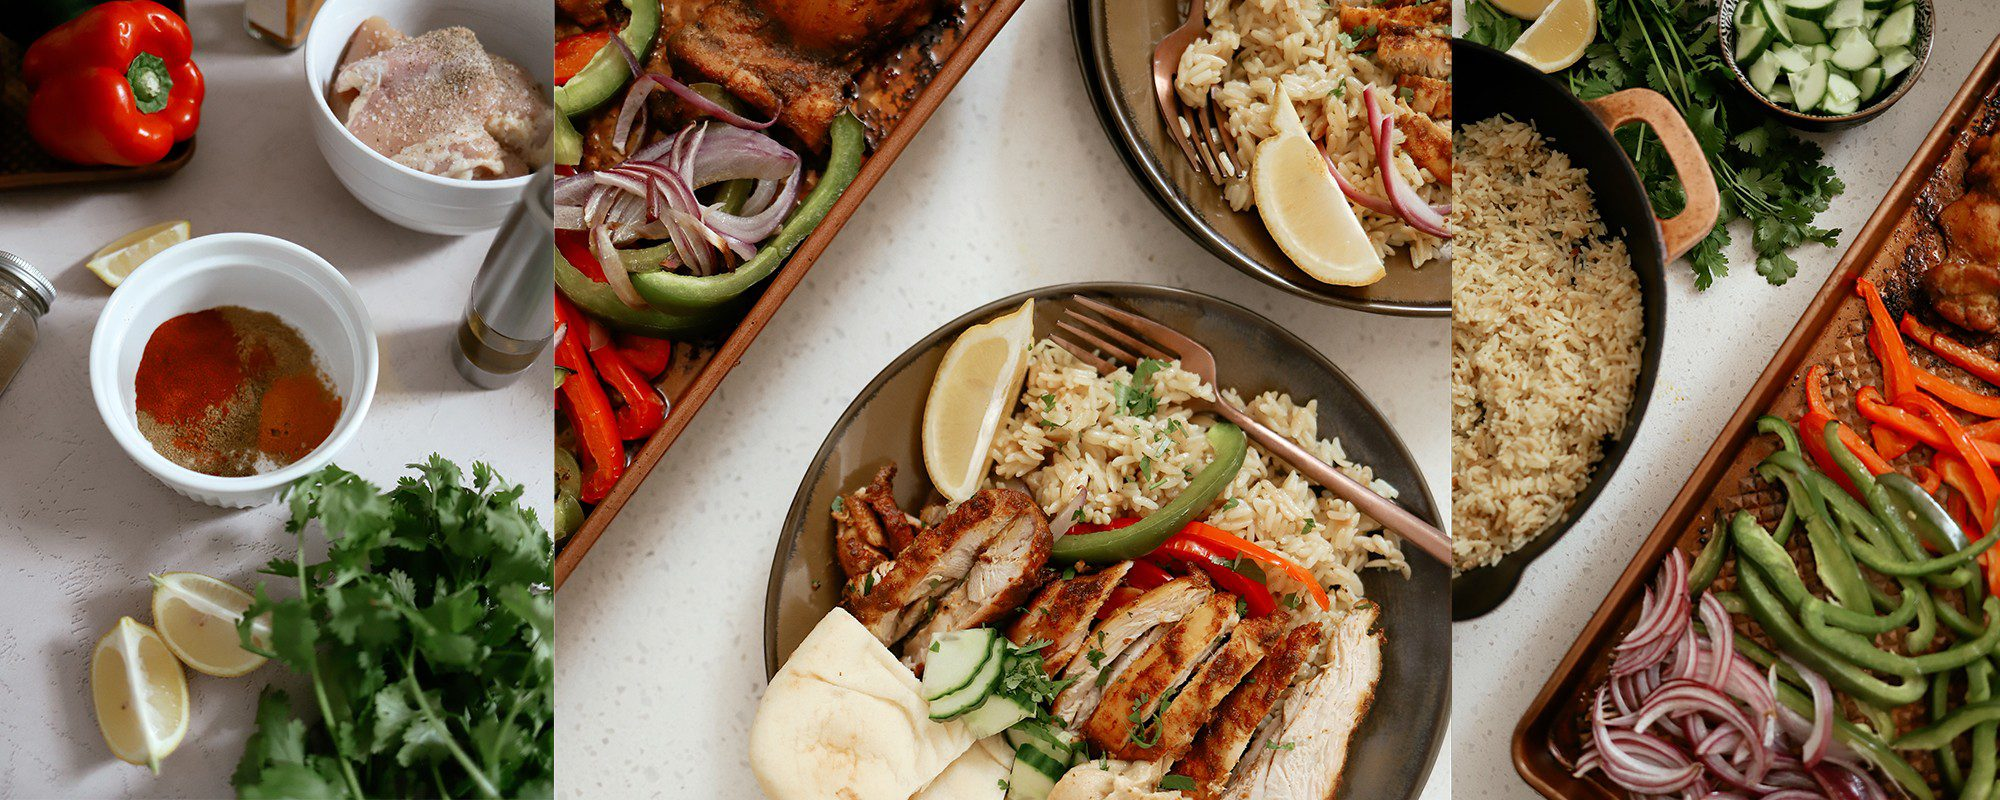 Sheet Pan Chicken Shawarma with Rice Recipe